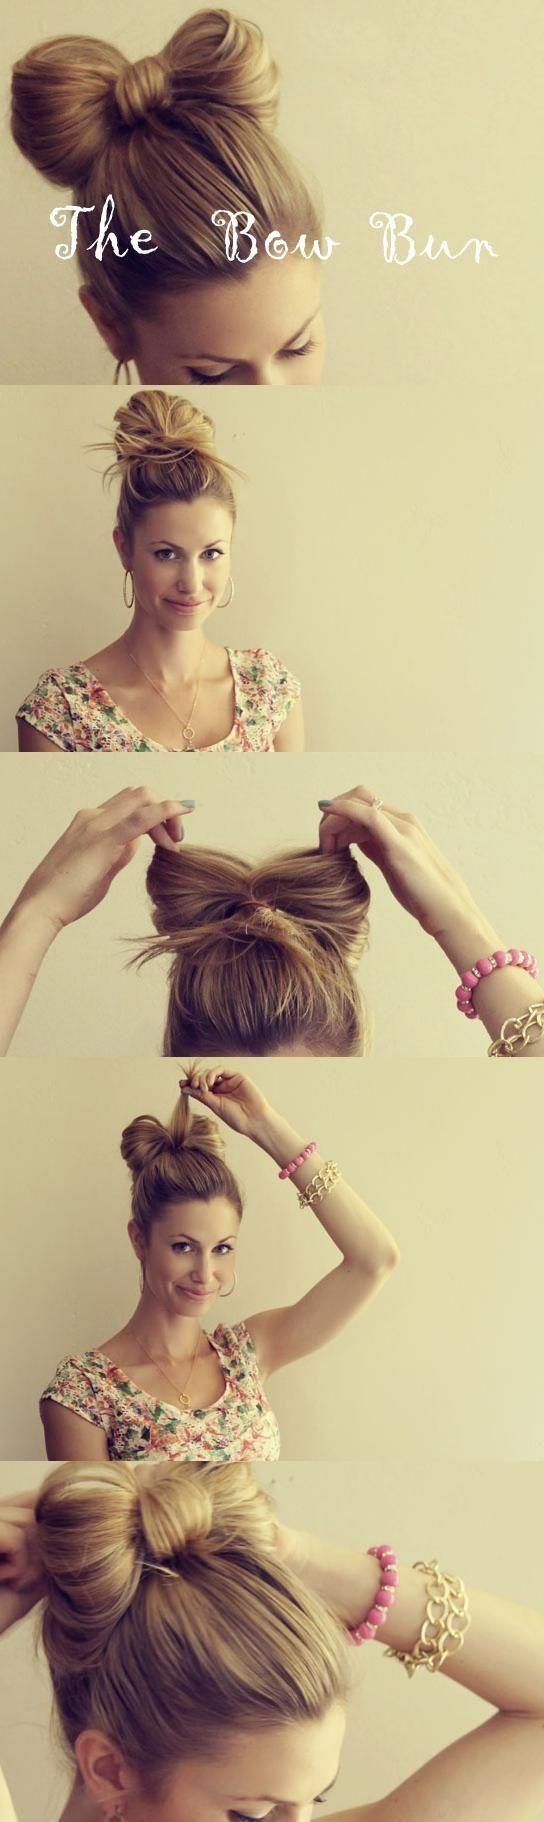 DIY The Bow Bun Hairstyle DIY The Bow Bun Hairstyle